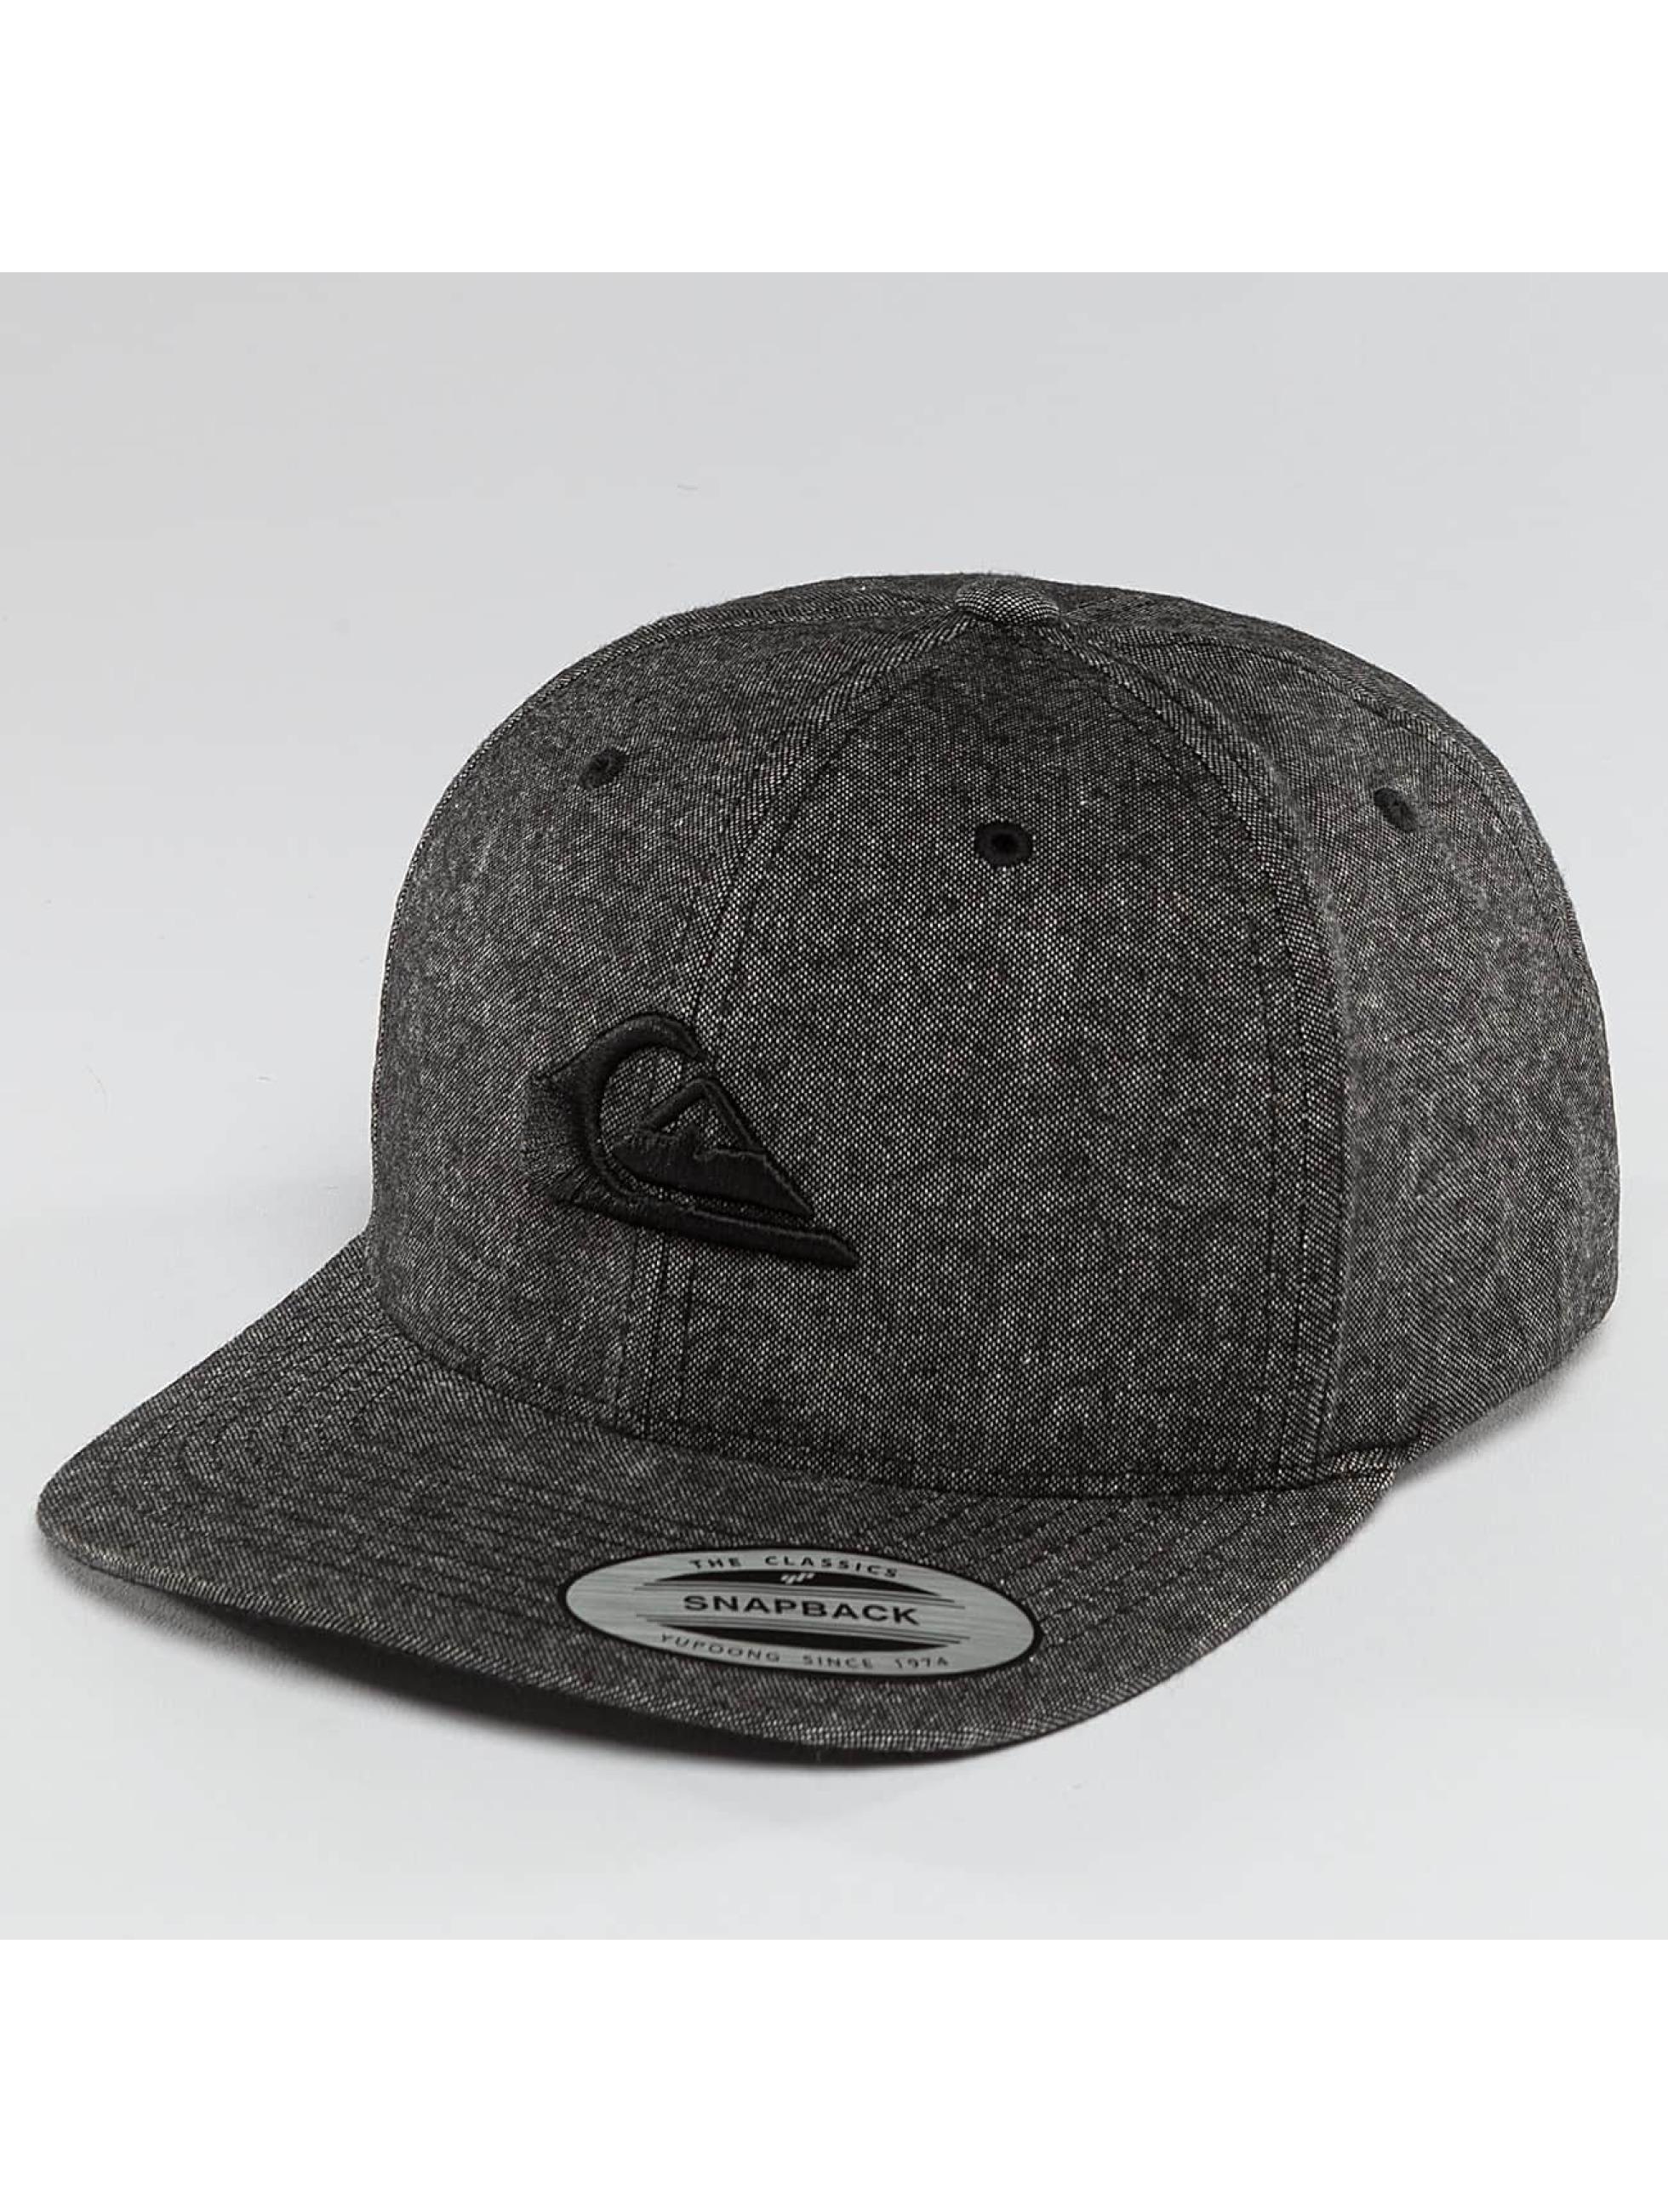 Quiksilver Snapback Cap Decades Plus gray